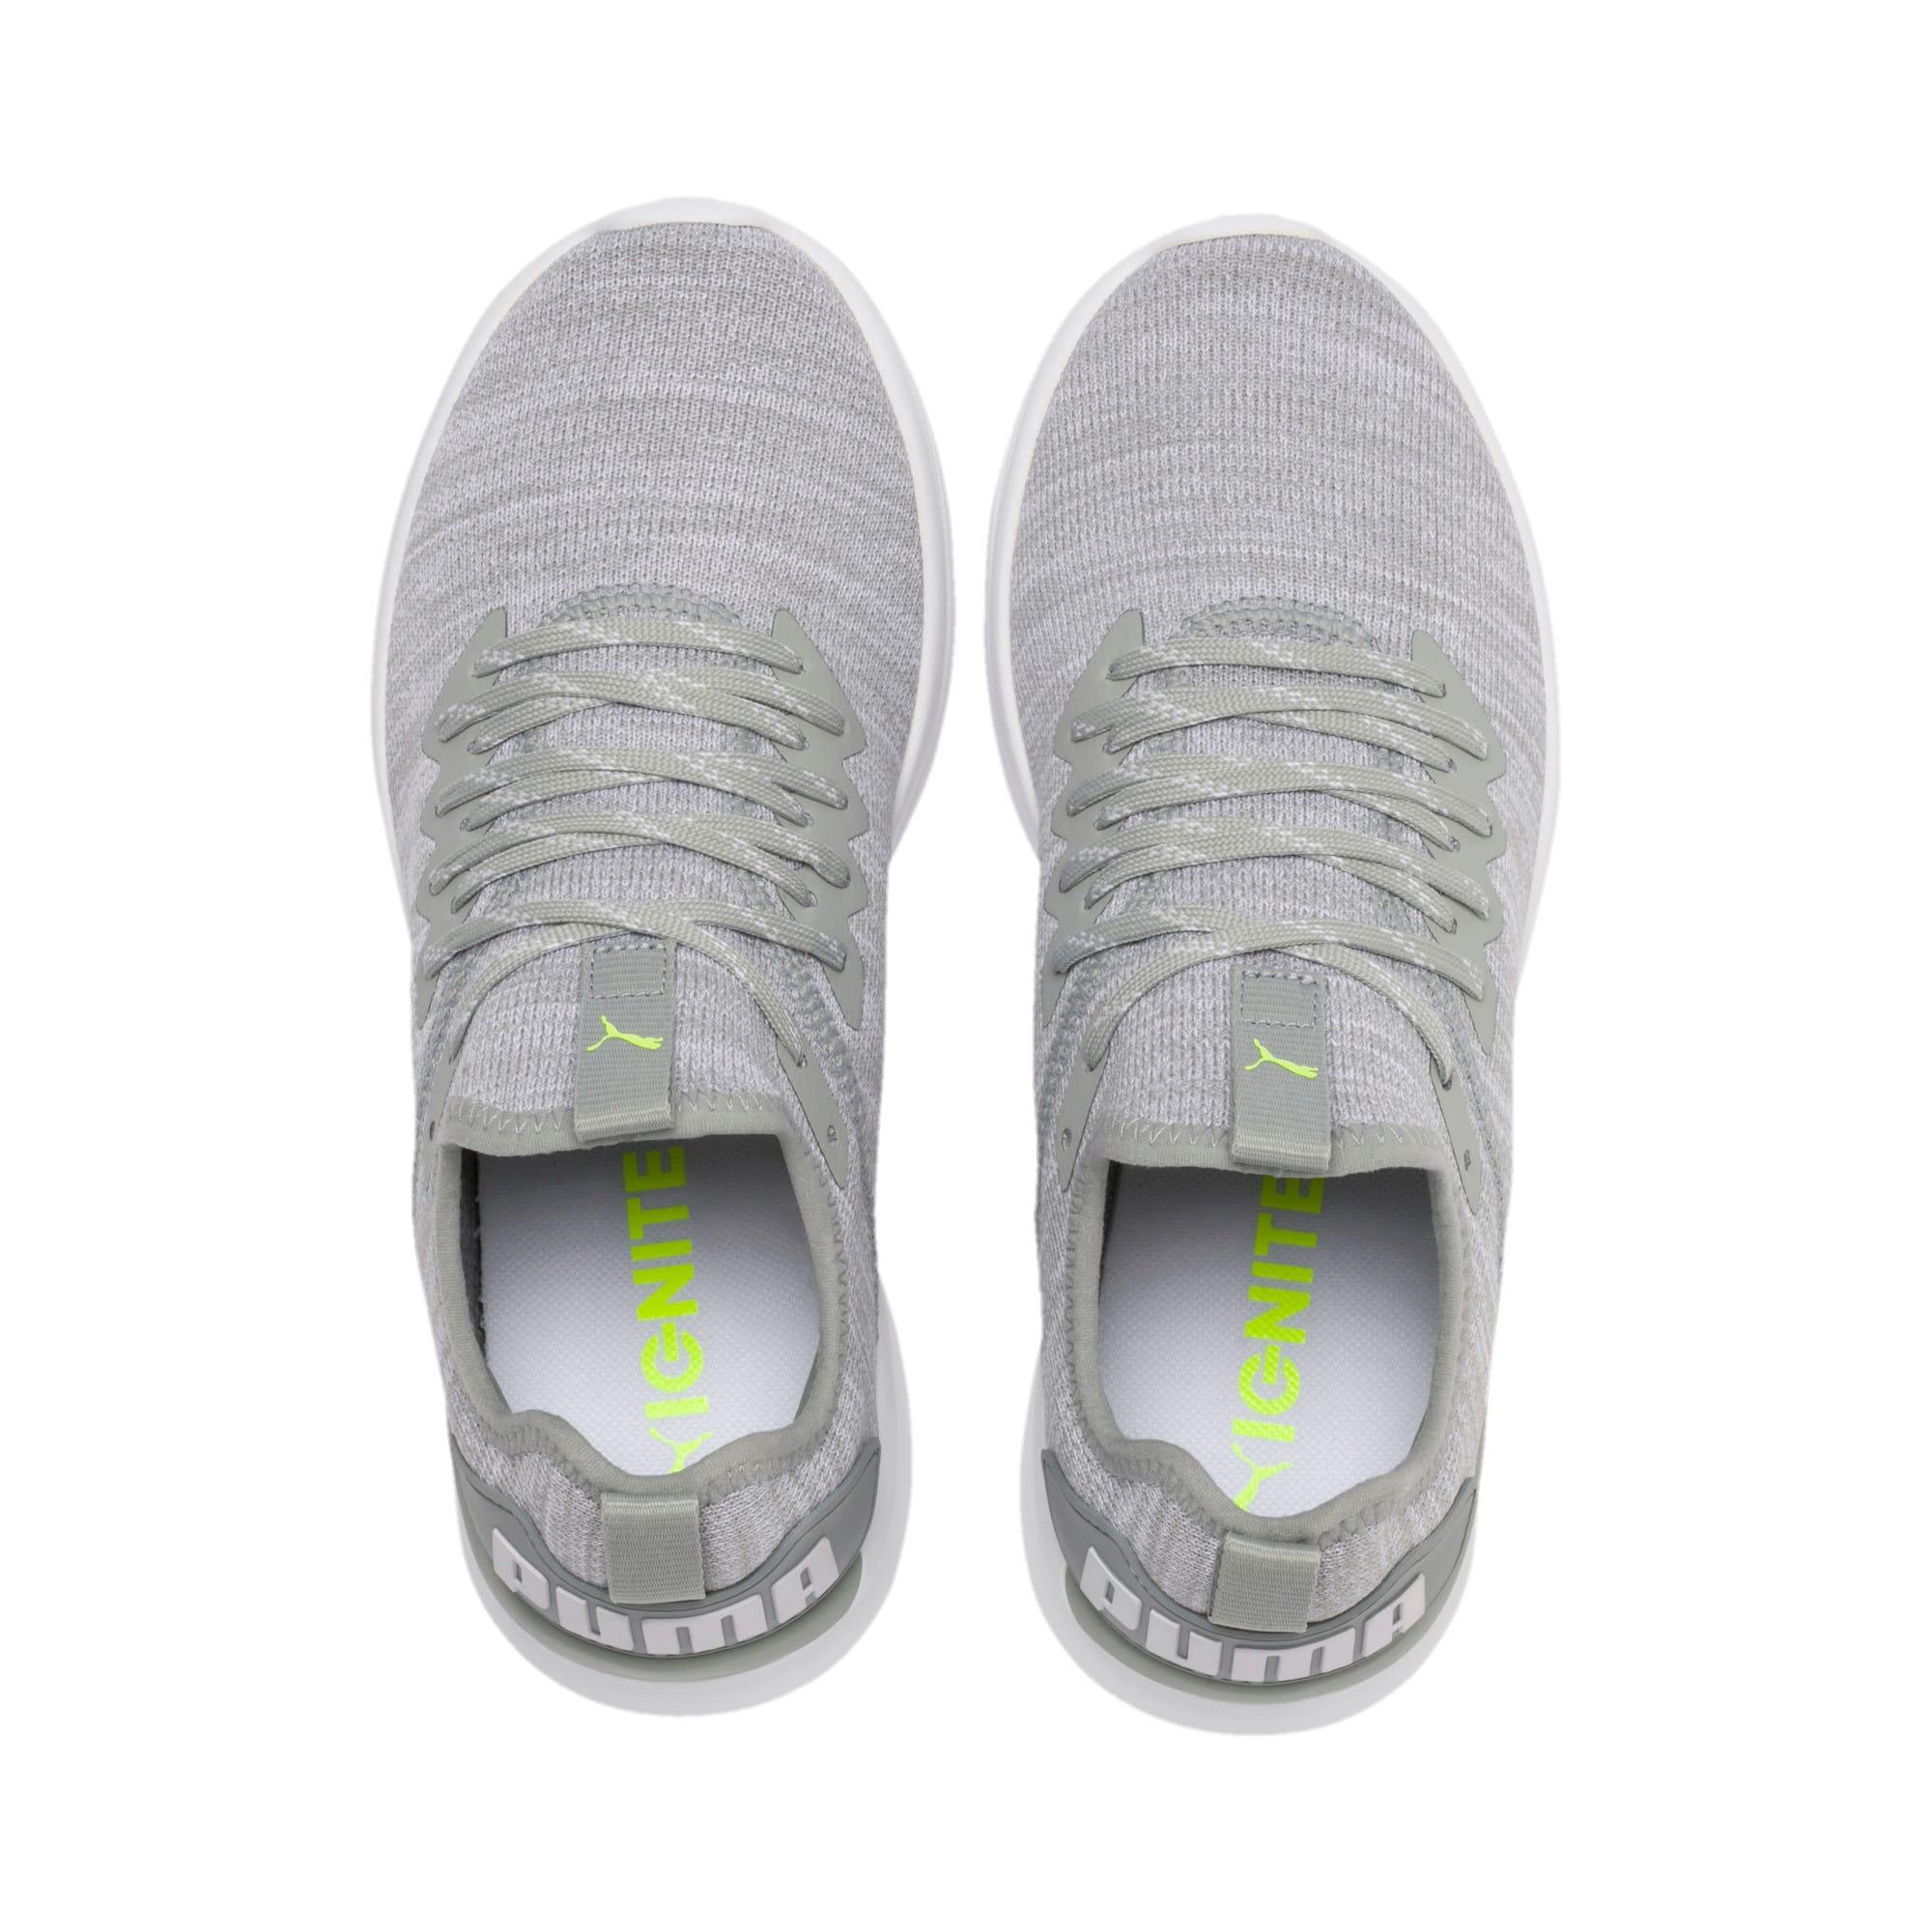 Thumbnail 7 of IGNITE Flash evoKNIT Women's Running Shoes, Quarry-White-Milky Blue, medium